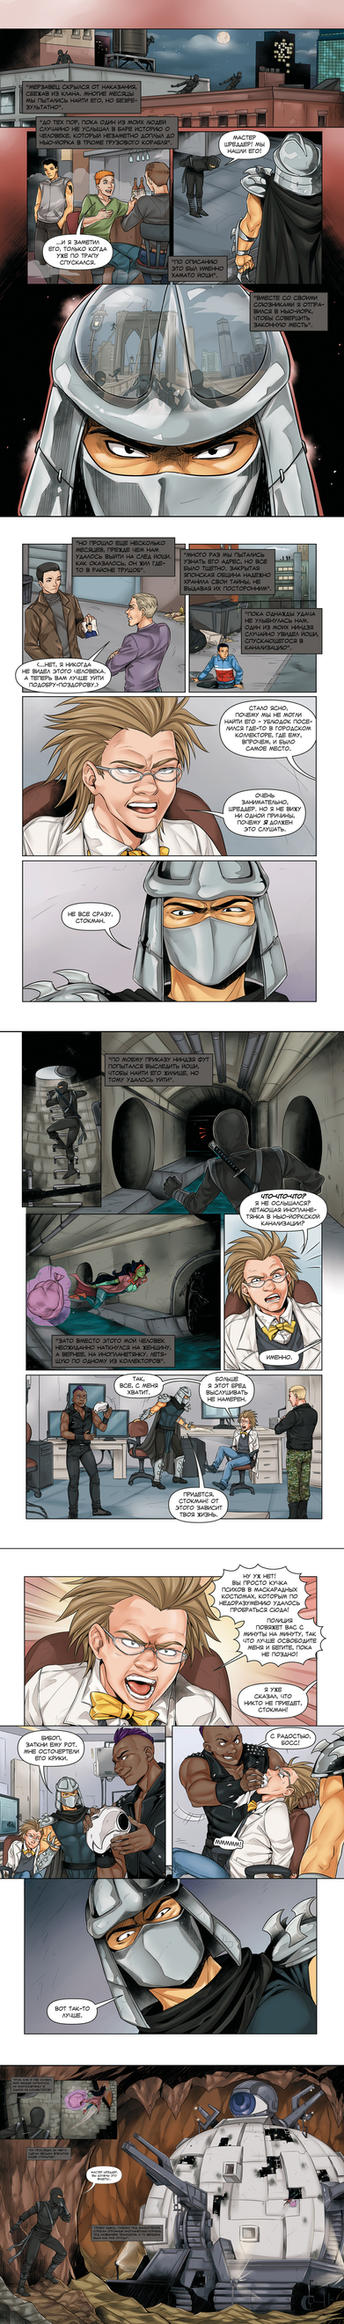 Origins 3: Baxter Stockman 3 by LinART